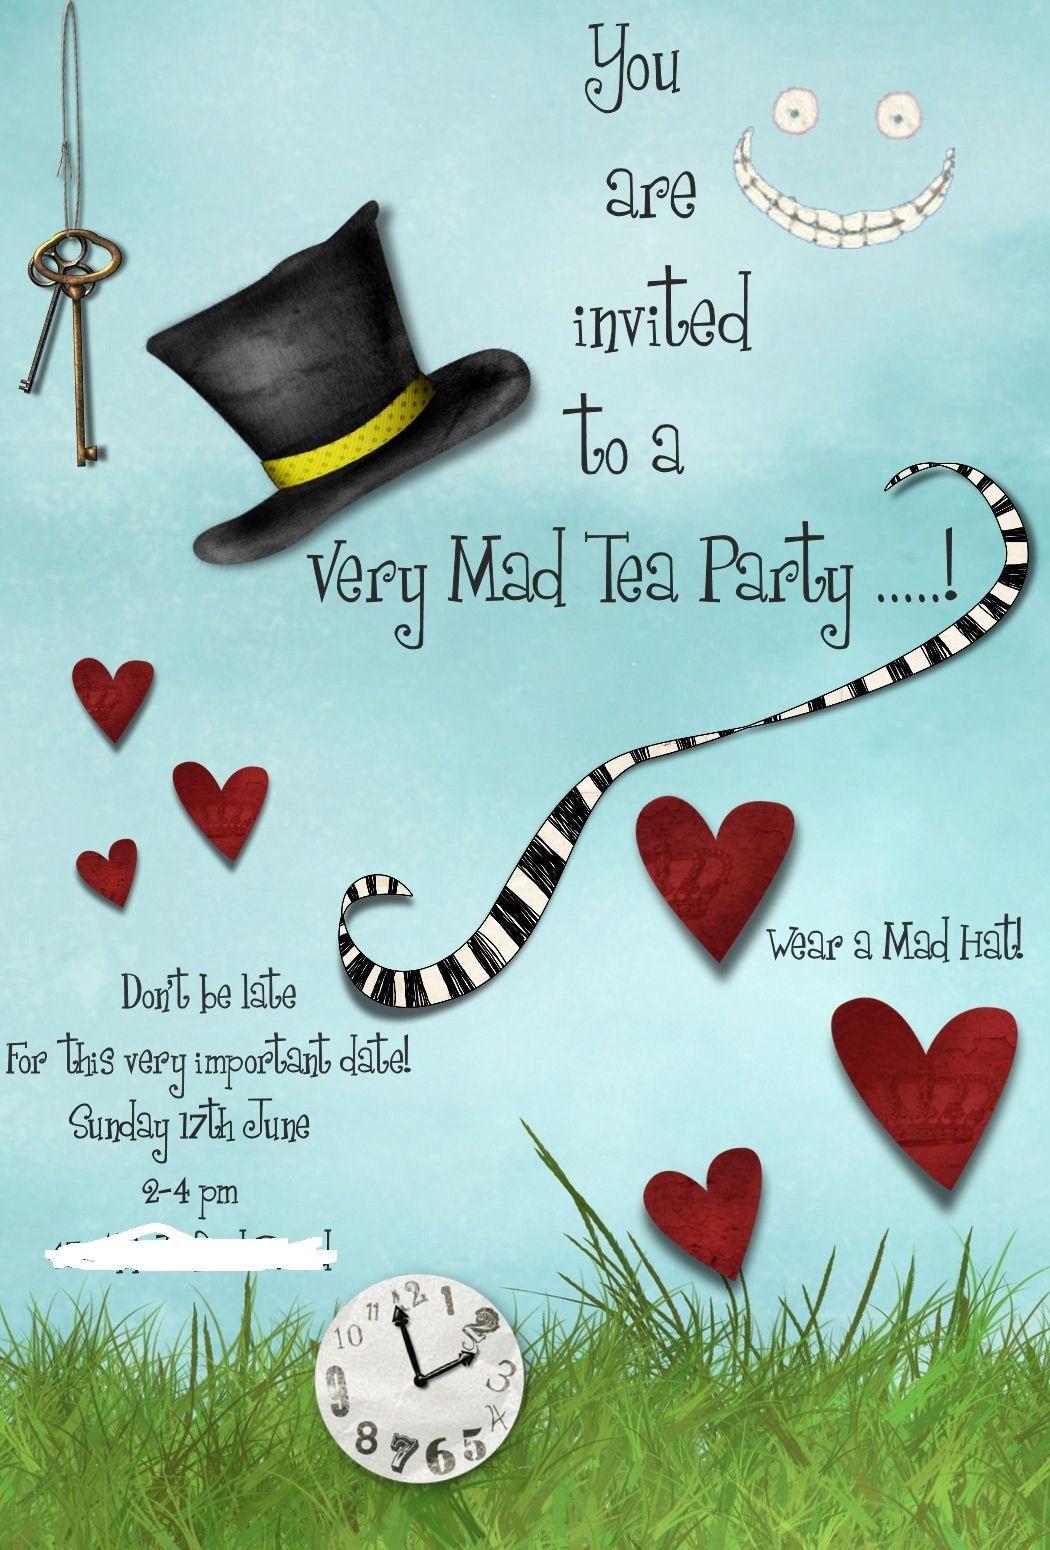 Mad Hatters Tea Party Invitation Template Free | Tea Party In 2019 - Mad Hatter Tea Party Invitations Free Printable